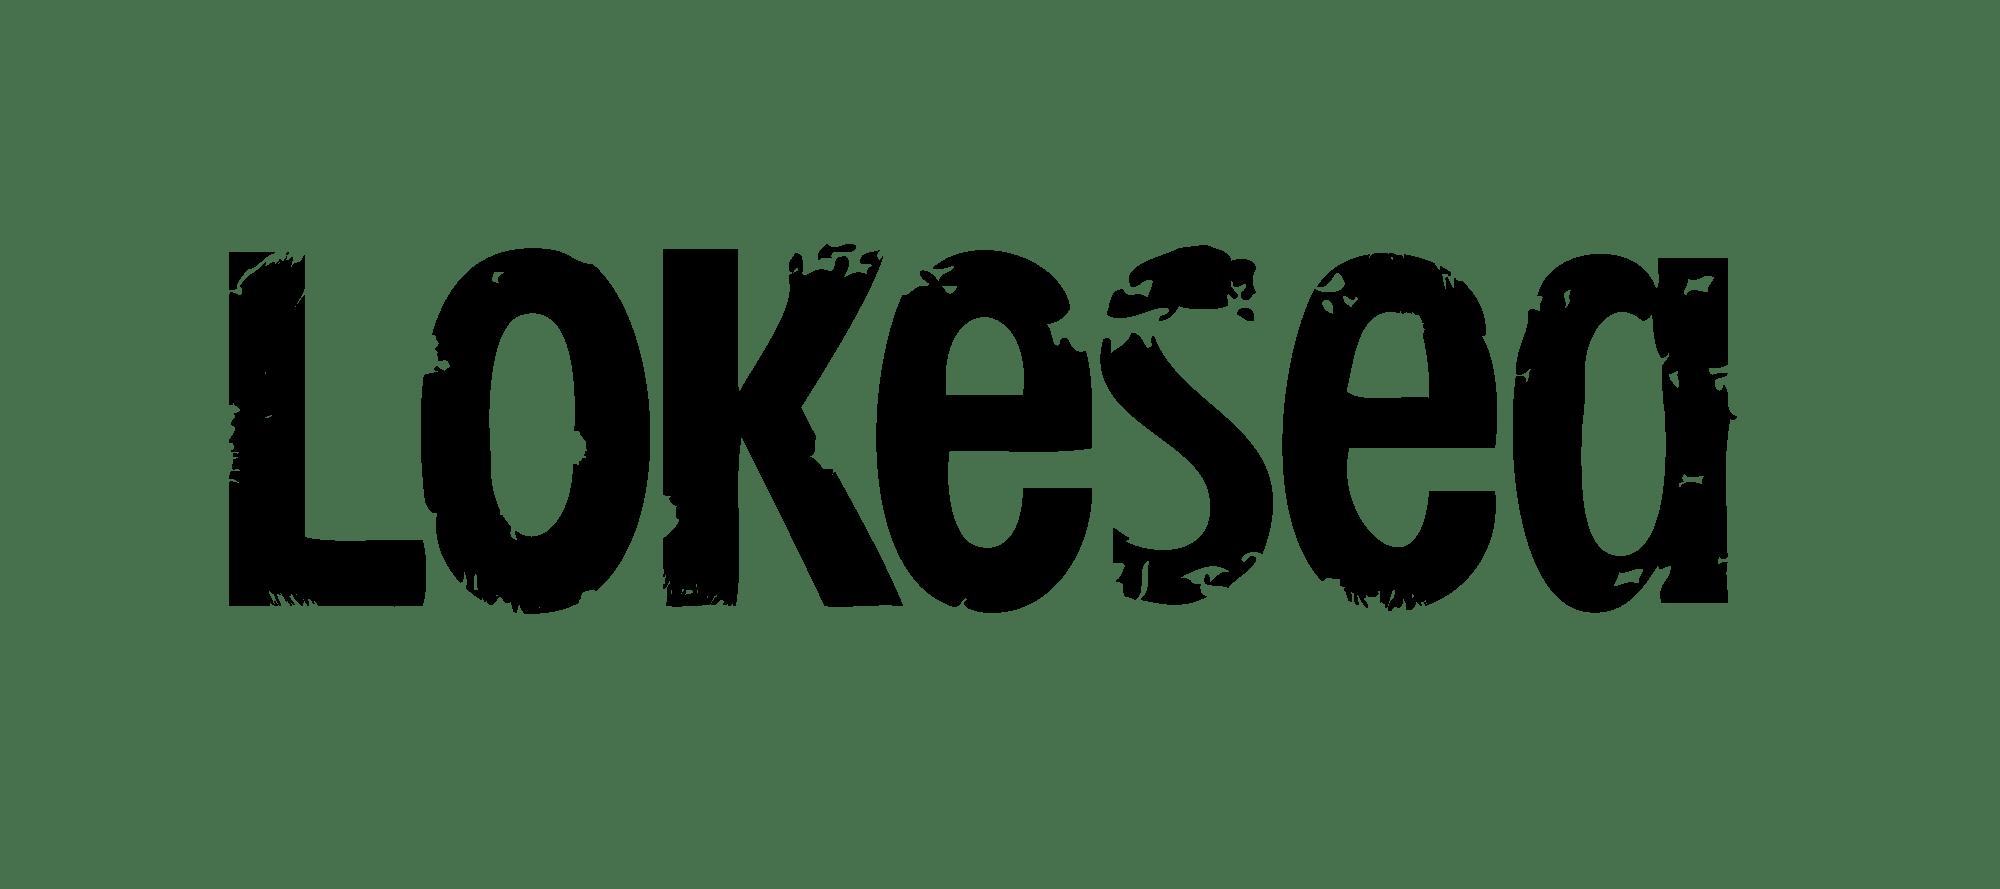 logo Lokesea